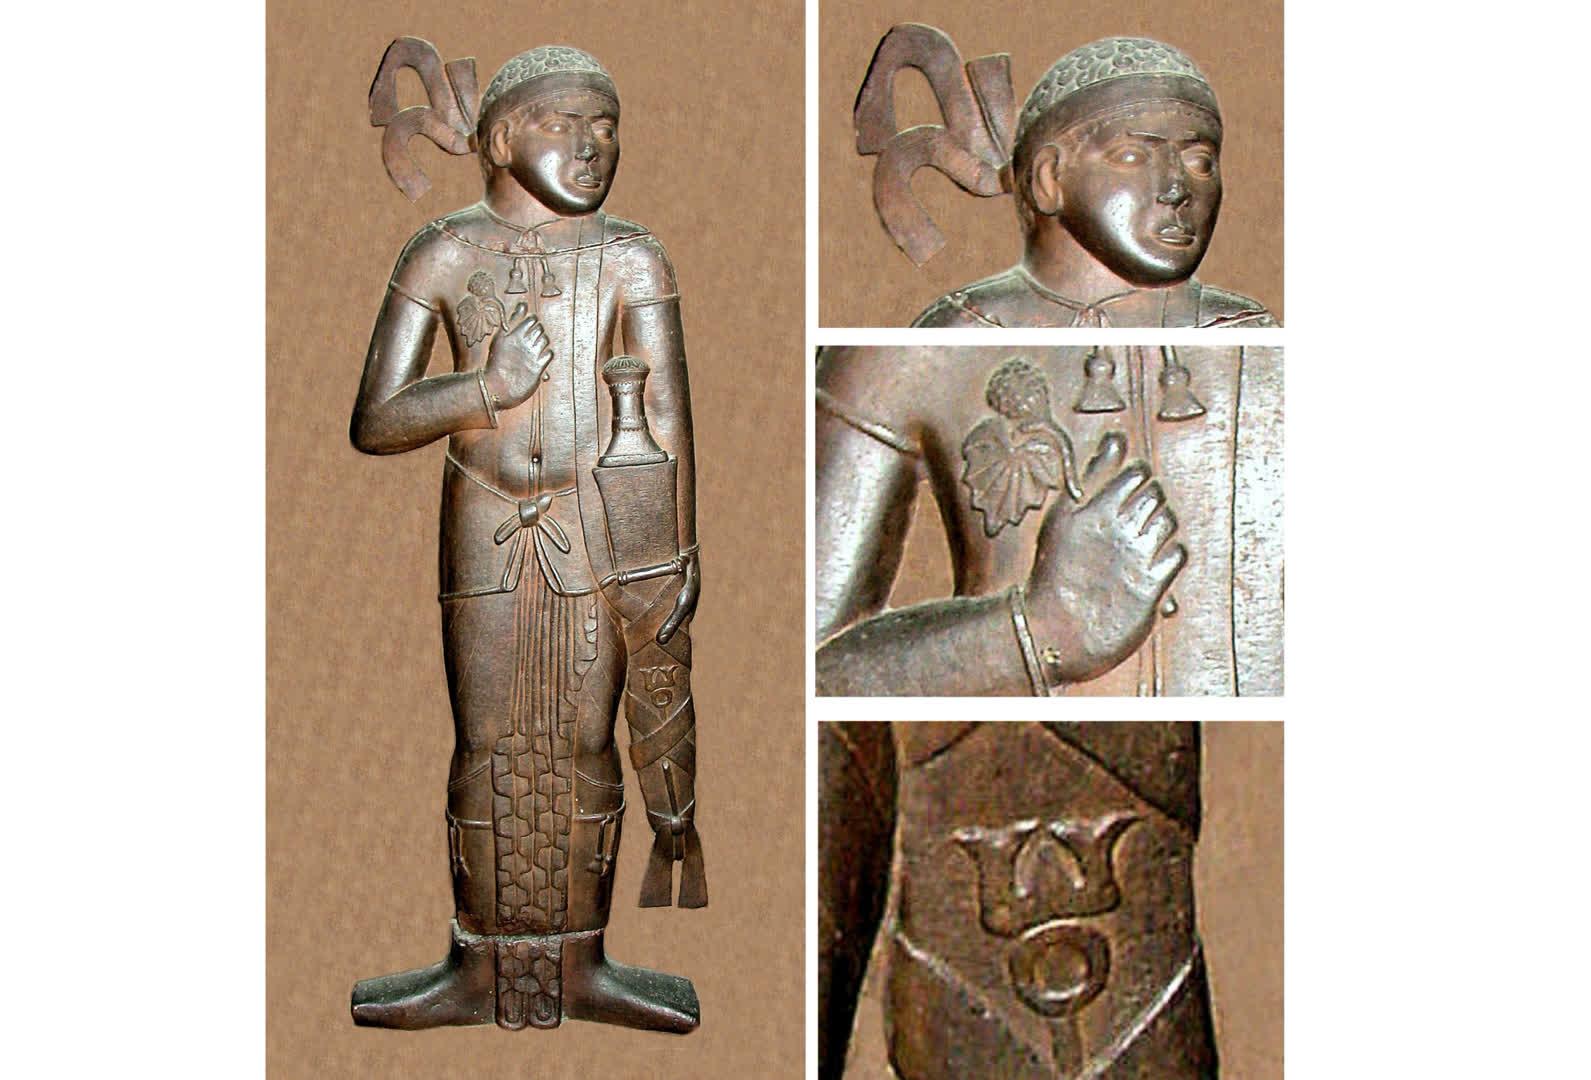 The Yavana (Greek) Warrior from Bharhut